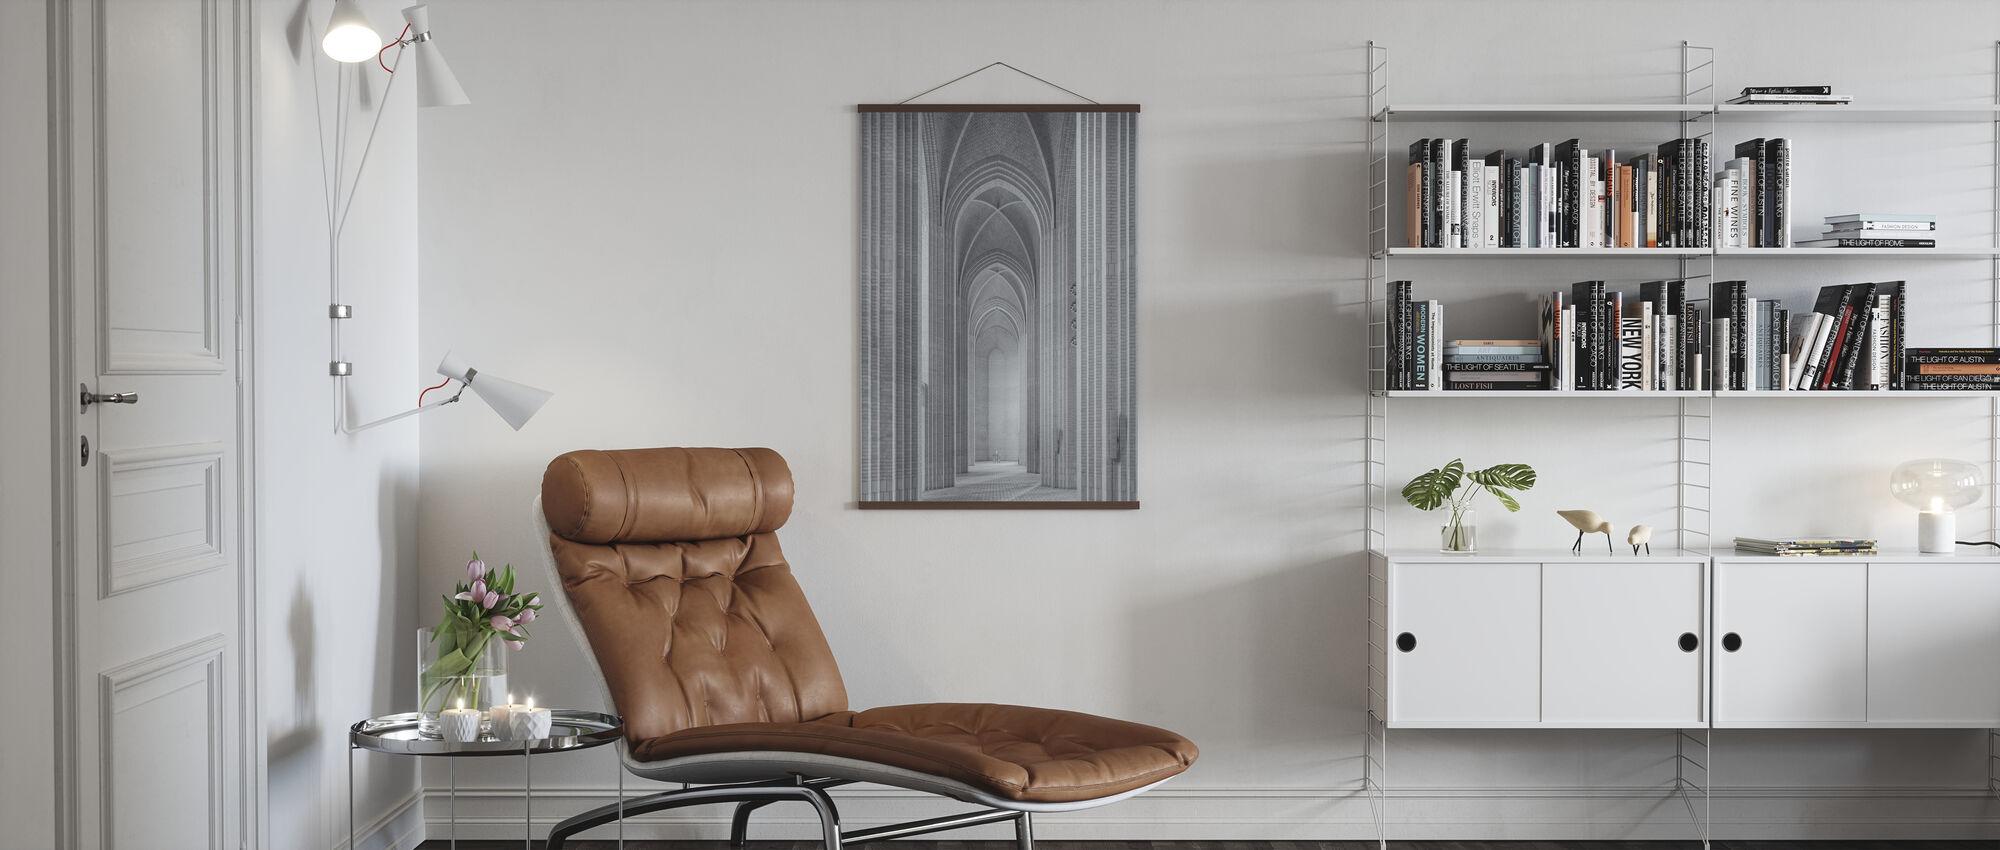 Grundtvig Kirche - Poster - Wohnzimmer